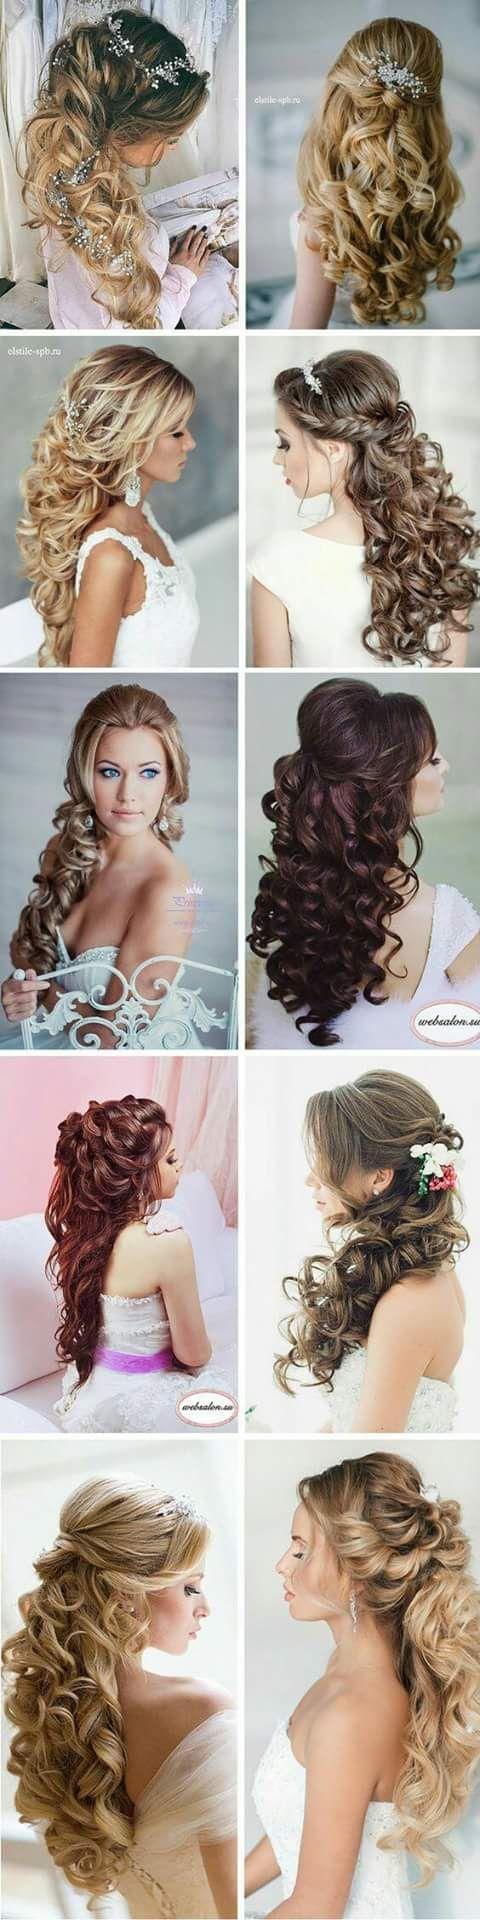 Wedding hairstyles hair pinterest weddings hair style and wedding